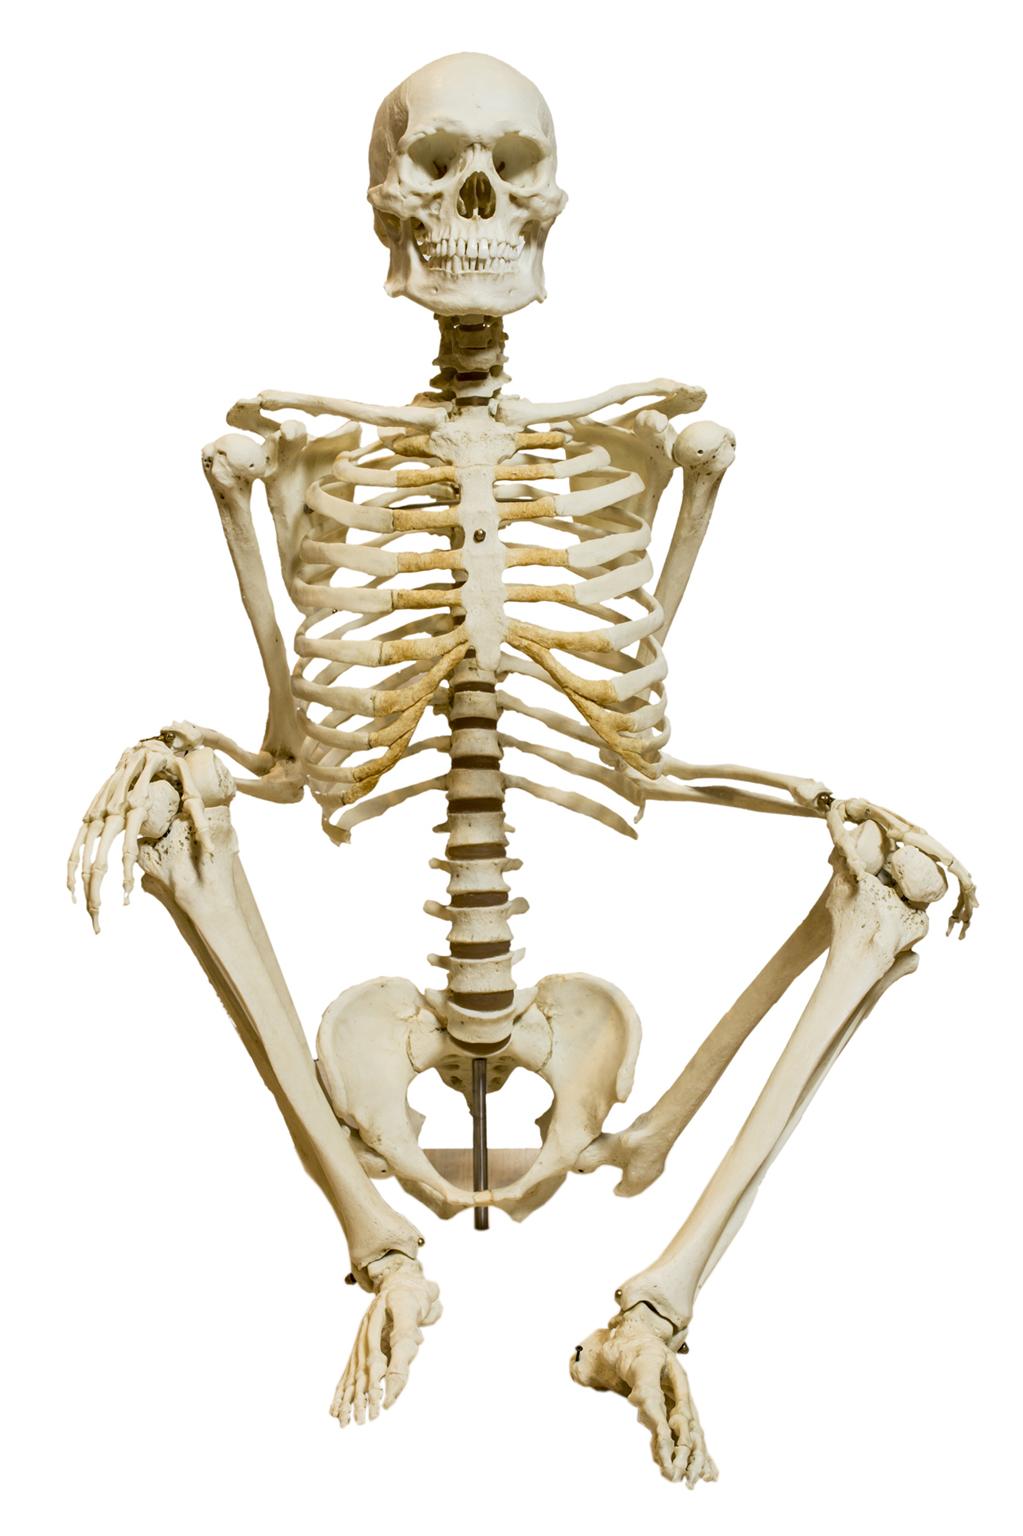 Esqueleto Humano Wikipedia La Enciclopedia Libre